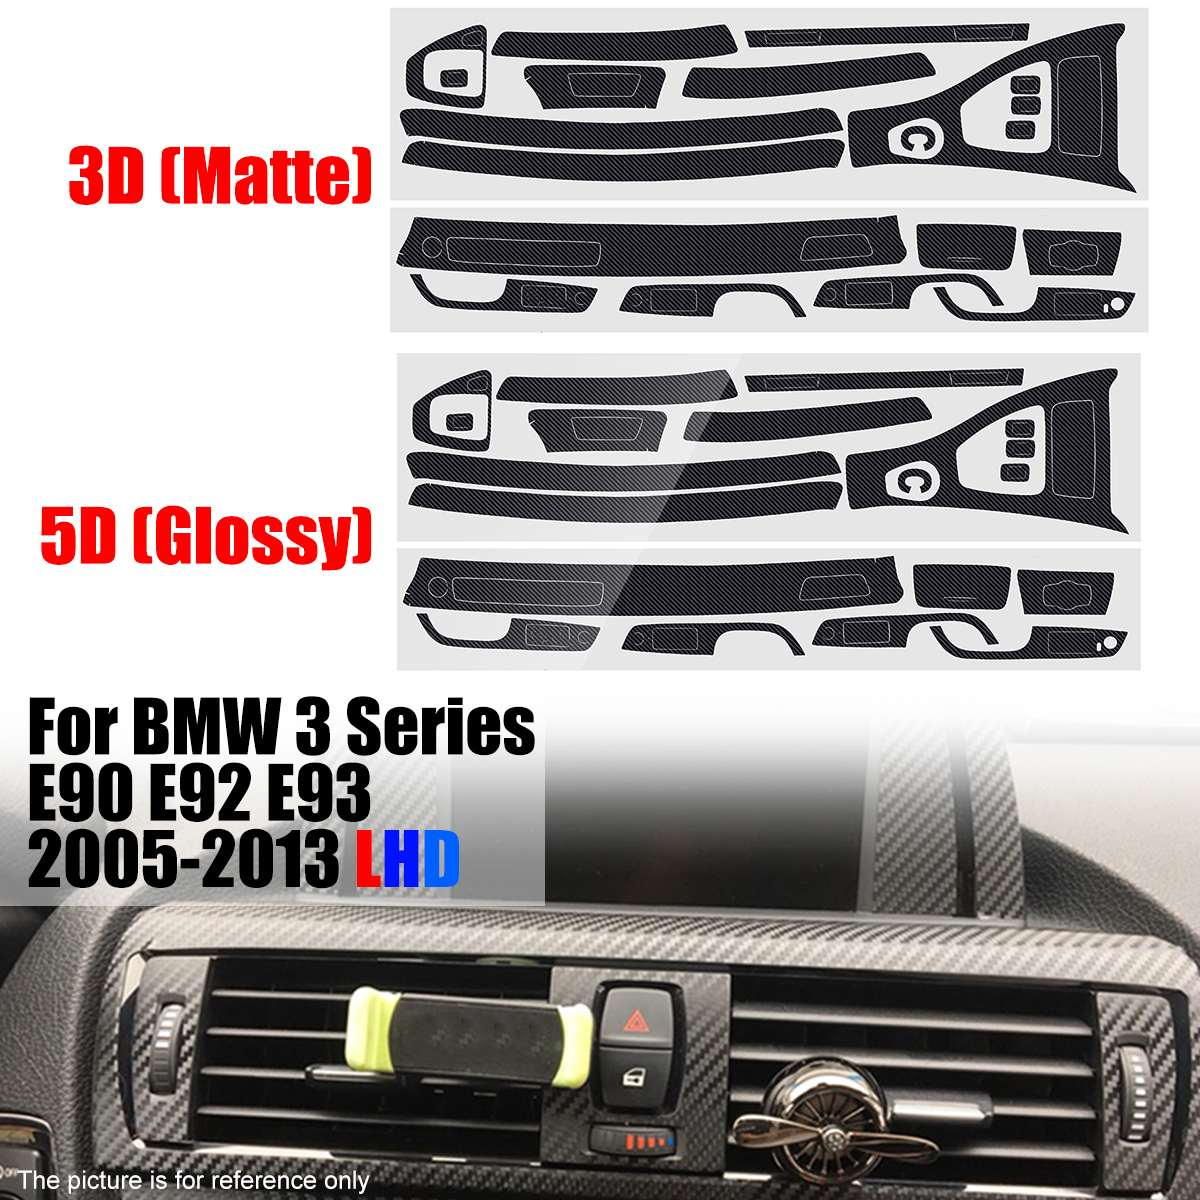 Egal 5pcs//Set Carbon Fiber Central Air Conditioning Vent Outlet Cover Trim Decor Decal for BMW 3 Series E90 E92 E93 2005-2012